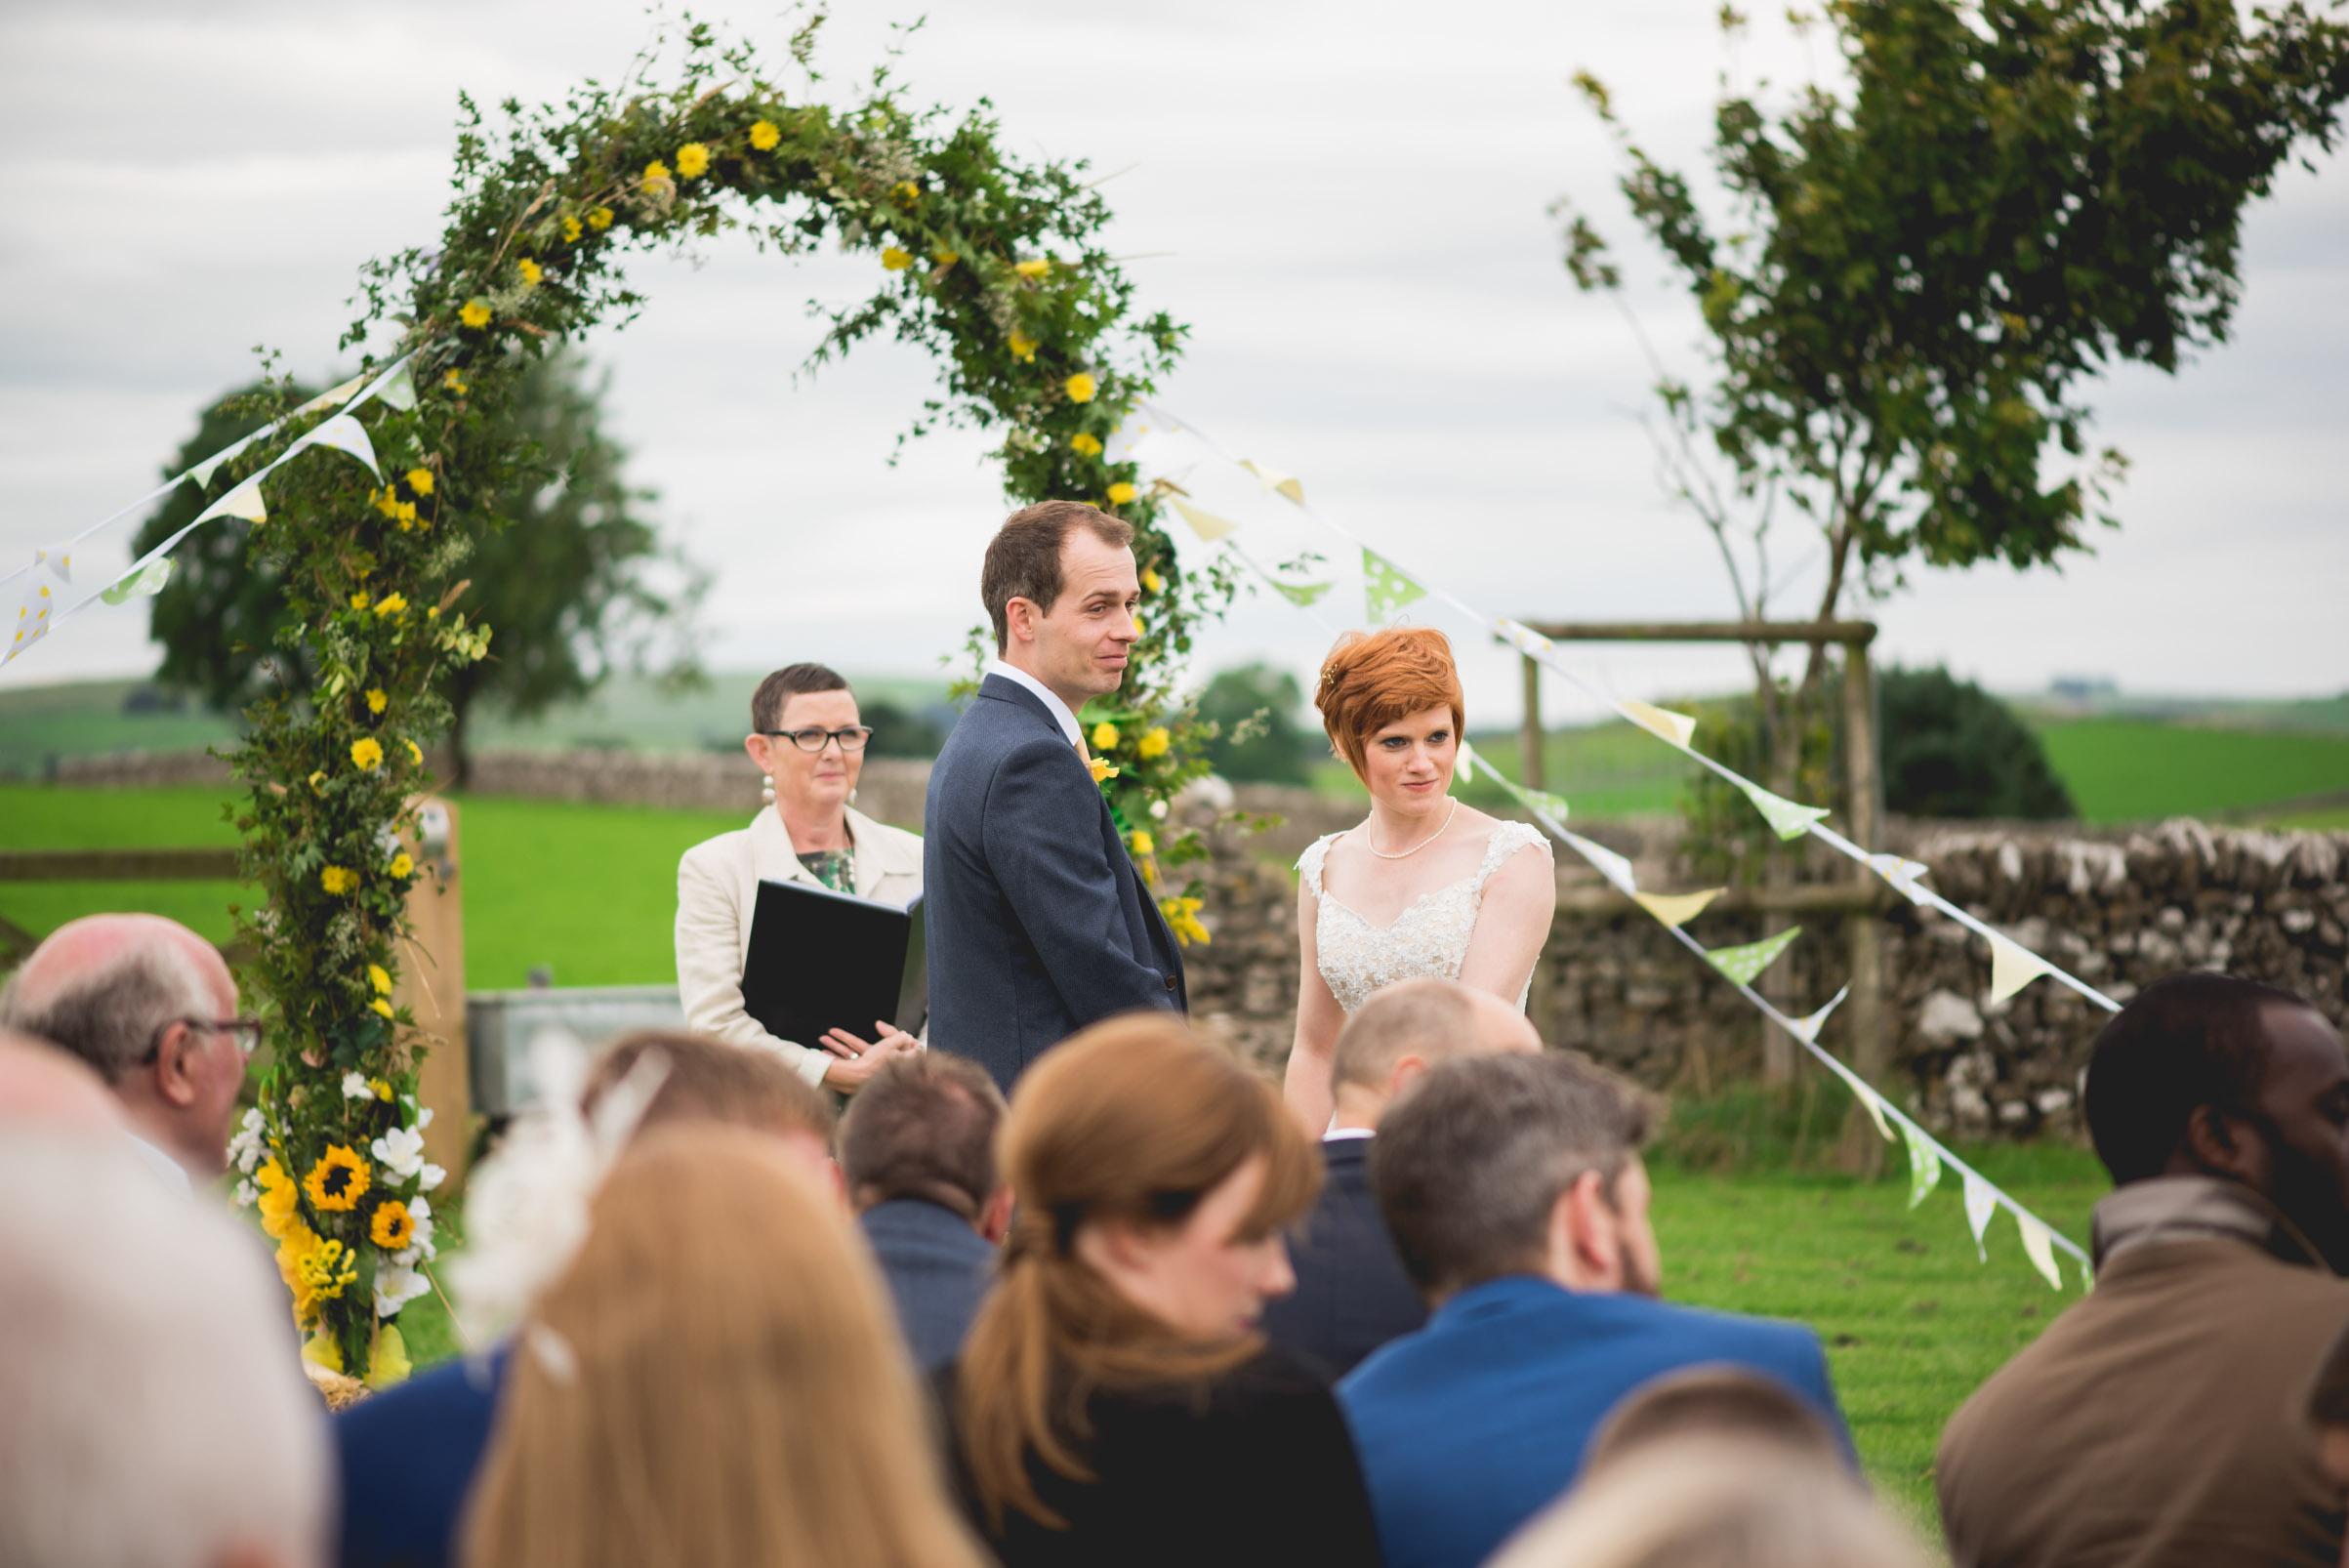 Peak+district+farm+wedding+lower+damgate+photographer-132.jpg